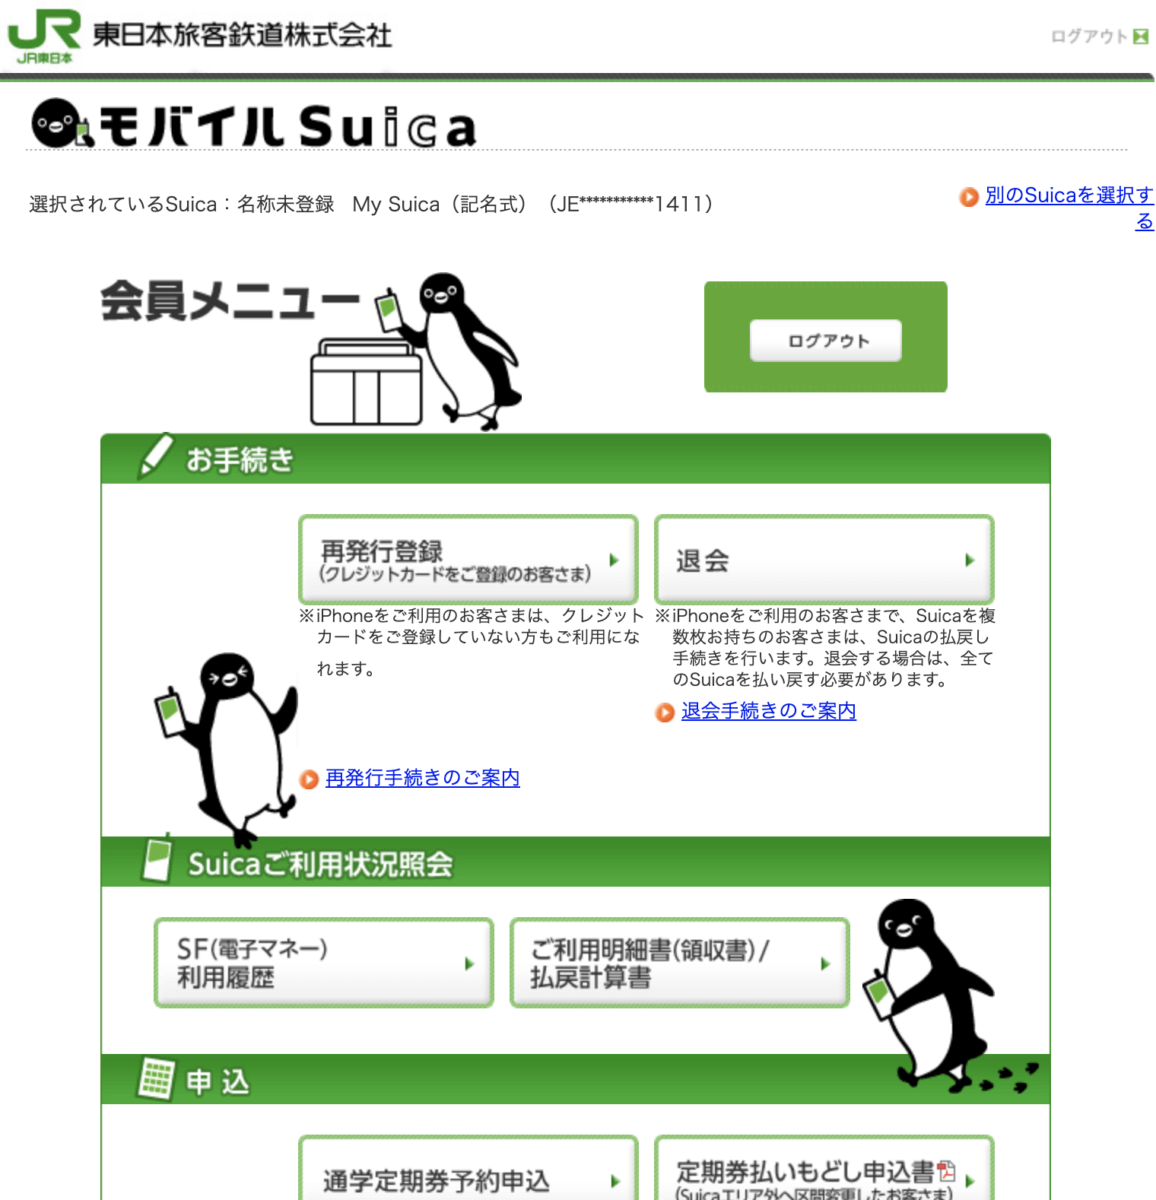 mobilesuica-login